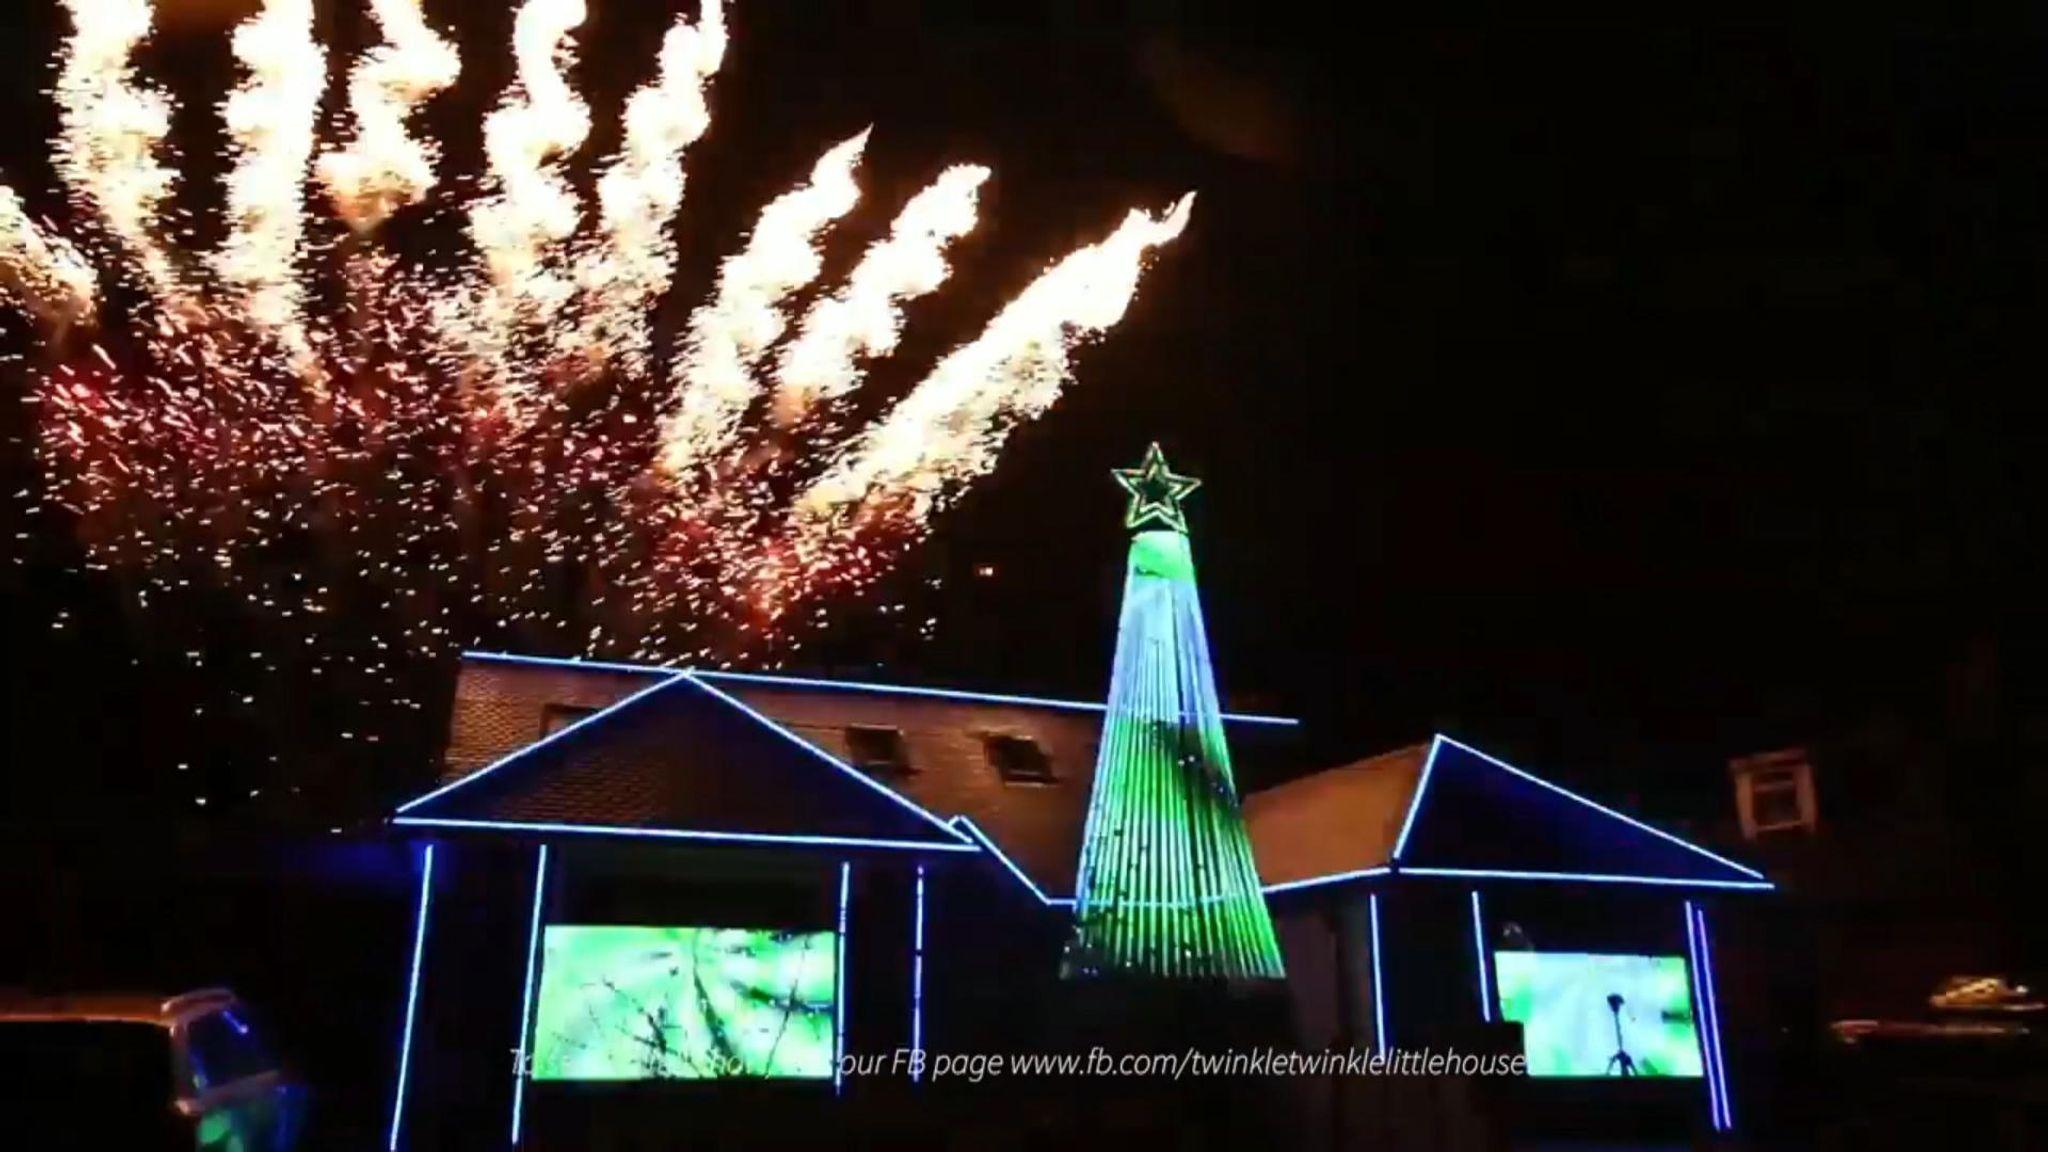 Christmas Lights Show Near Me.Dad Adorns Surrey Home With 22 500 Christmas Lights For